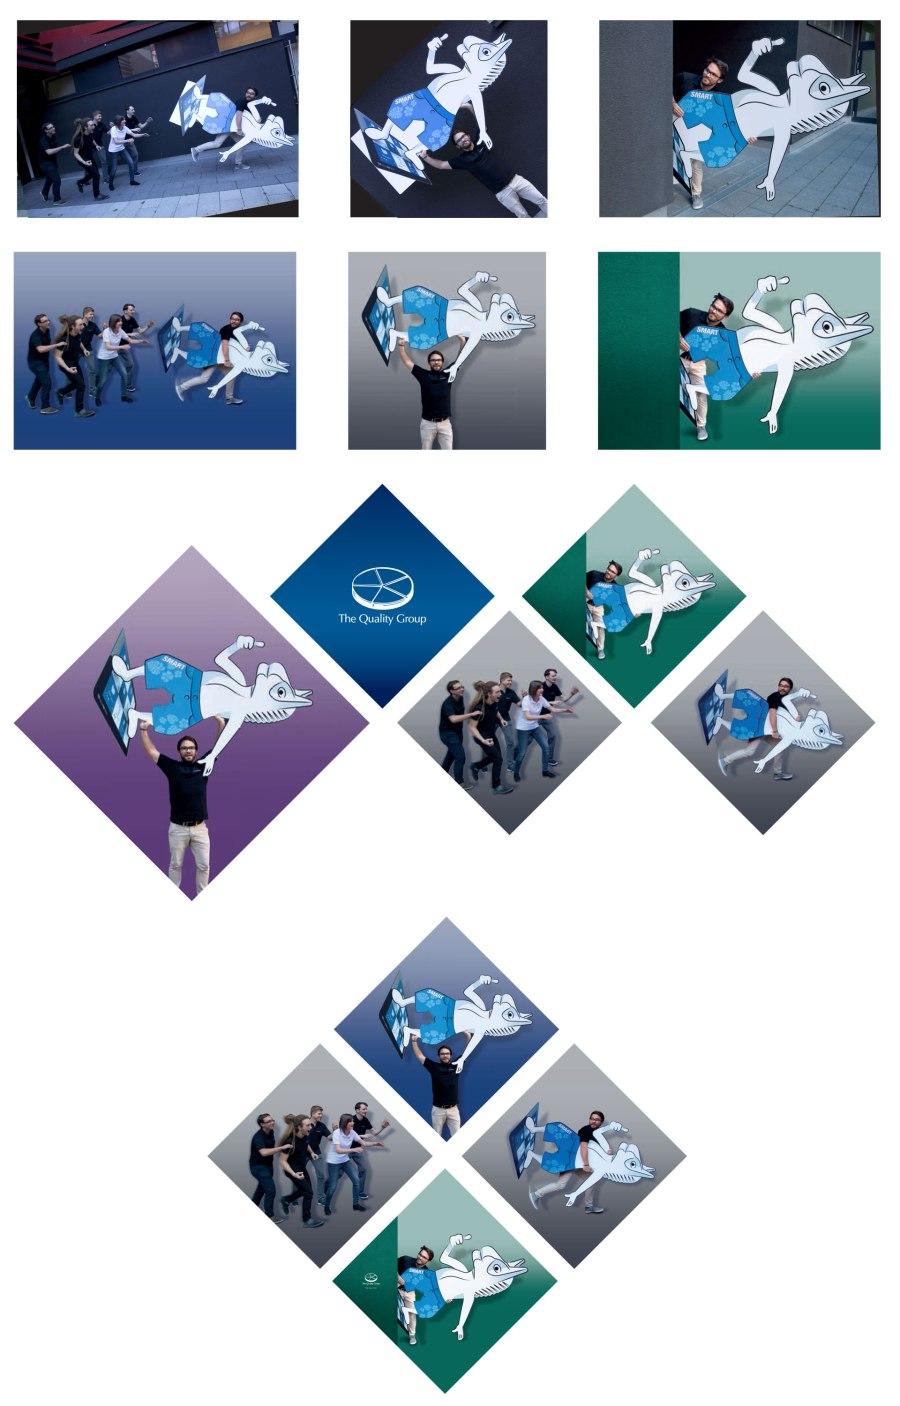 businessappplatform_news_tqg-art-2018_01